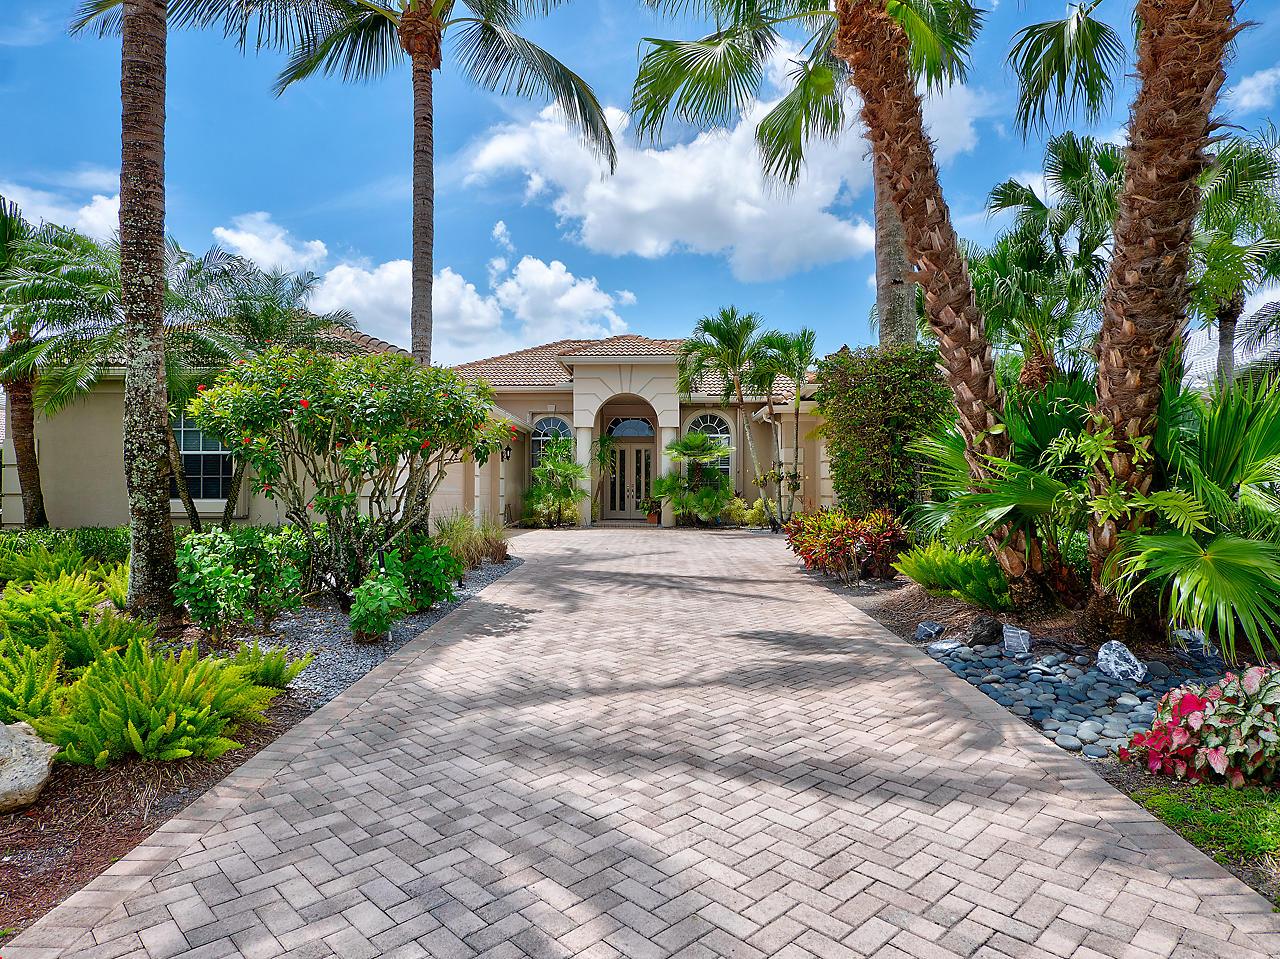 44 Bermuda Lake Drive, Palm Beach Gardens, Florida 33418, 4 Bedrooms Bedrooms, ,4.1 BathroomsBathrooms,A,Single family,Bermuda Lake,RX-10446589